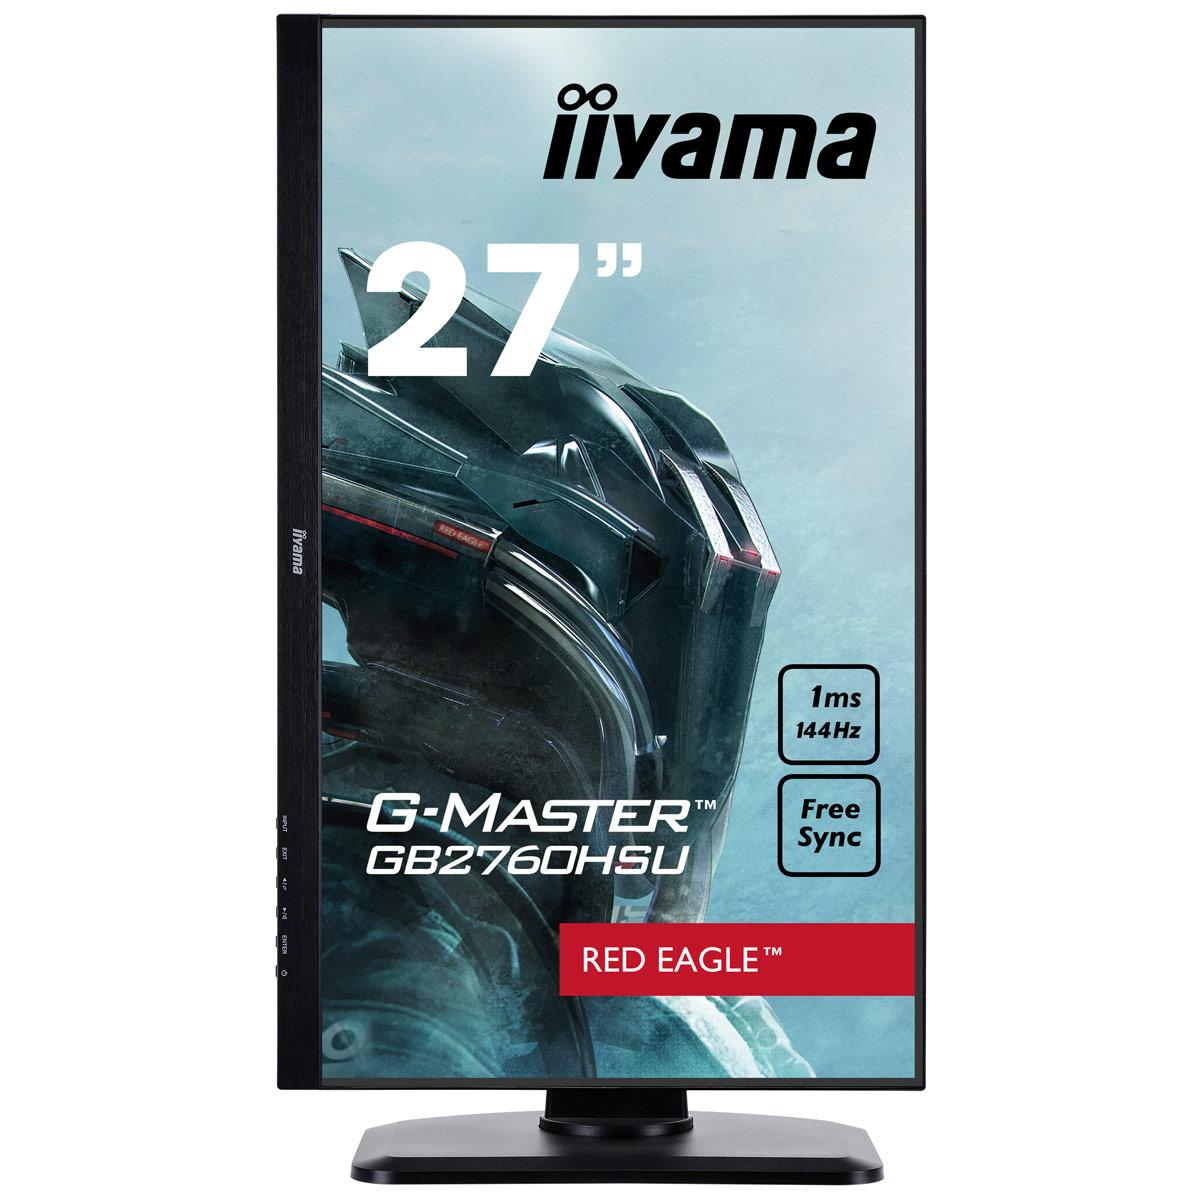 G-Master Red Eagle GB2760HSU-B1 (GB2760HSU-B1) - Achat / Vente Ecran PC sur Picata.fr - 3